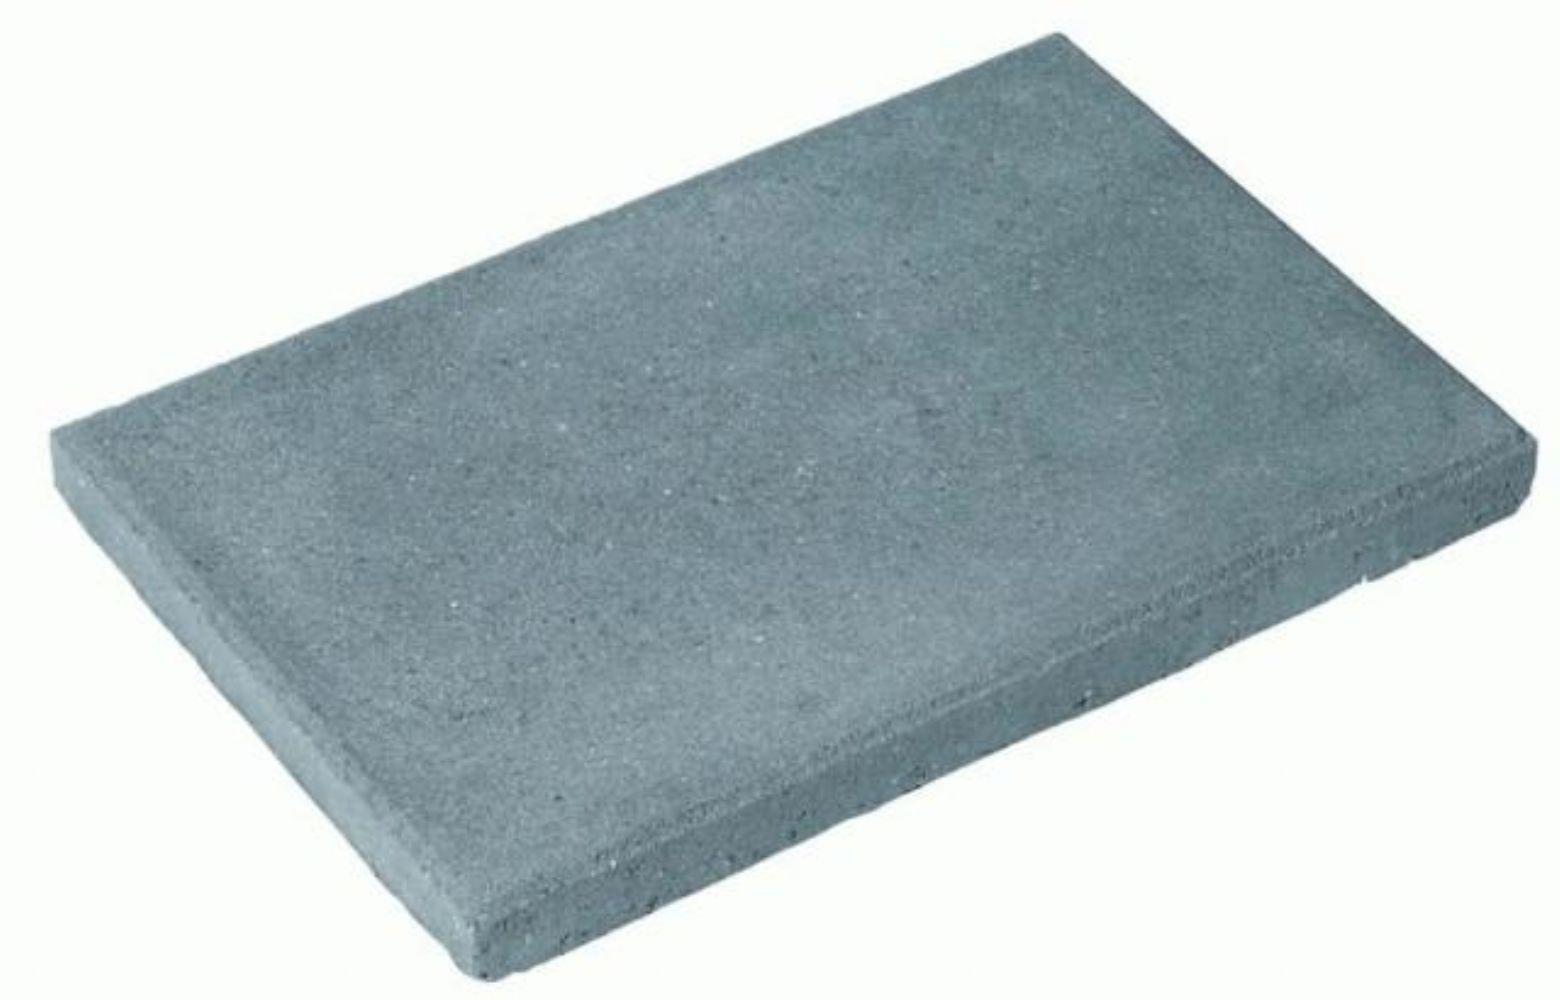 40-60 betontegel per m2